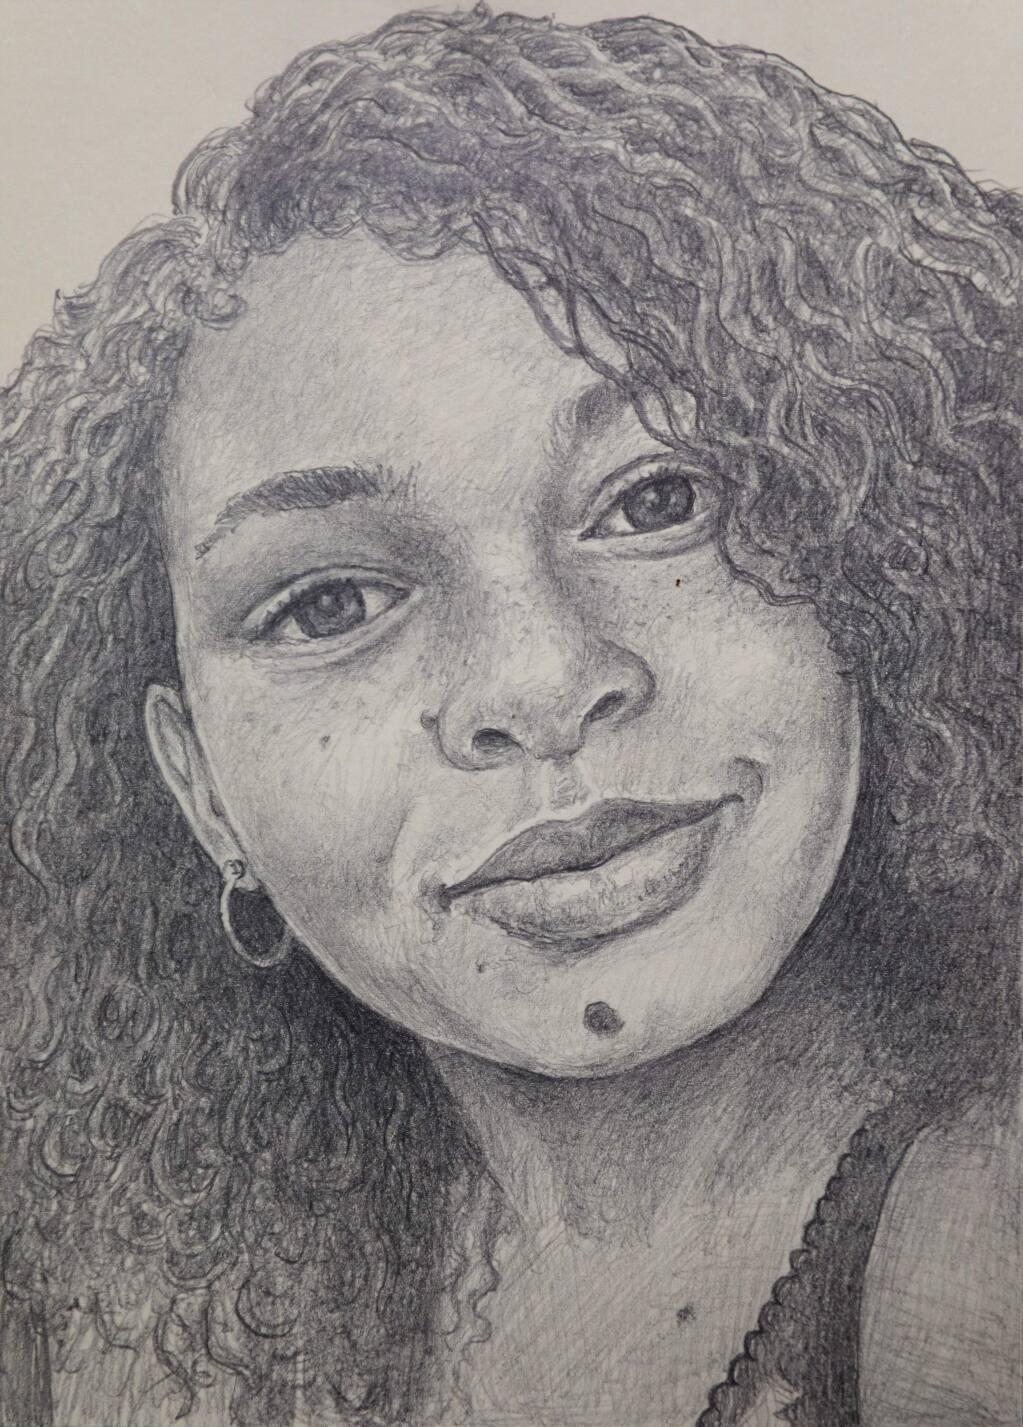 Helena Ramsay portrait by Tony Speirs.(Christopher Chung/ The Press Democrat)